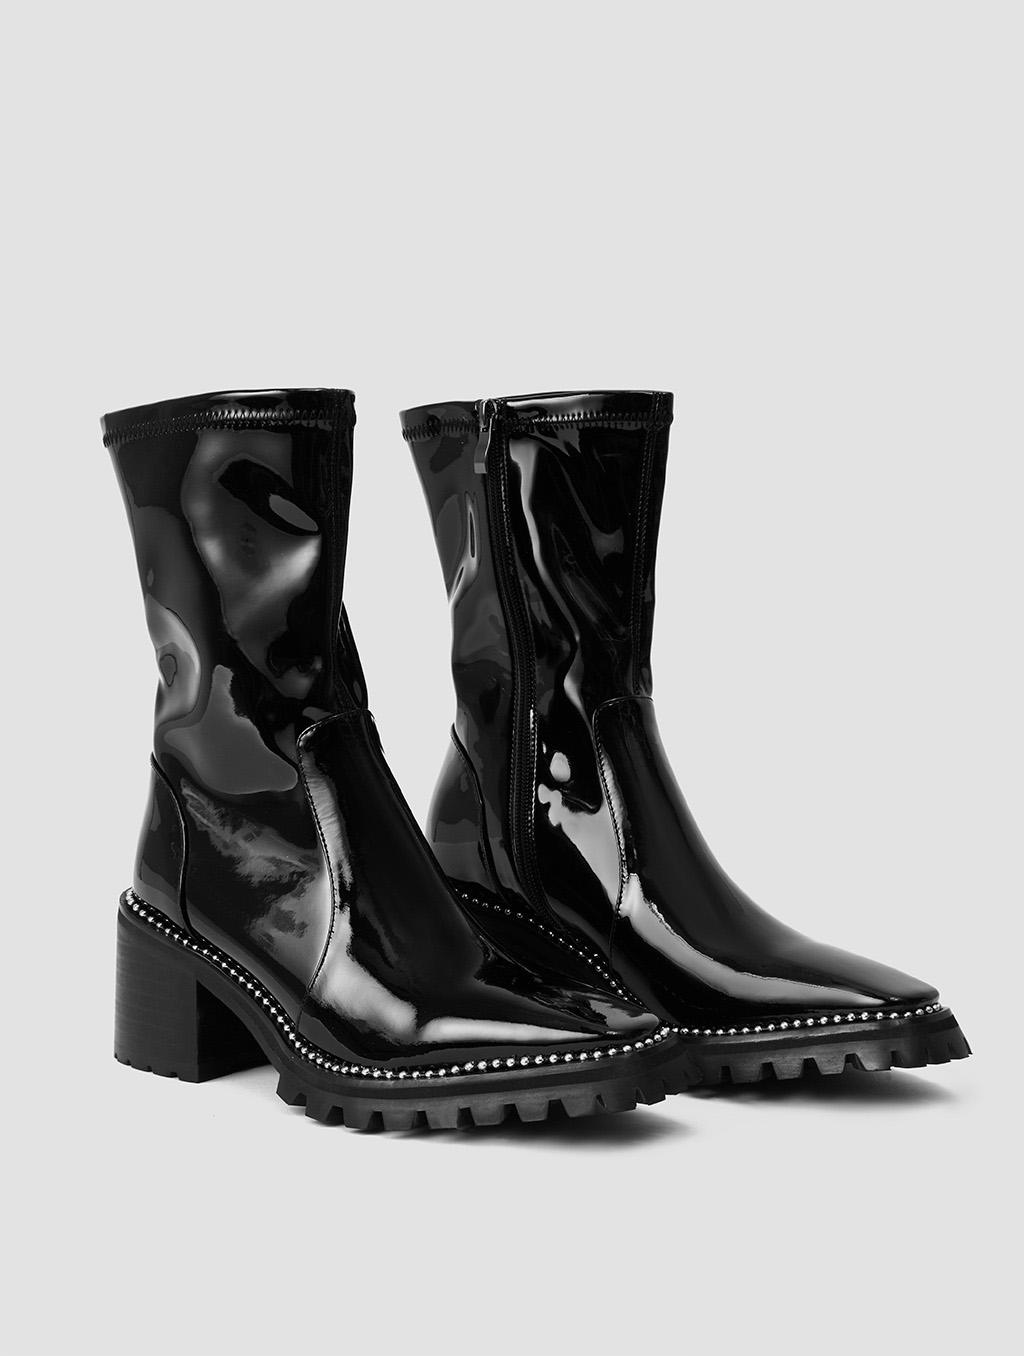 Silver Rhinestone Boots- side- black